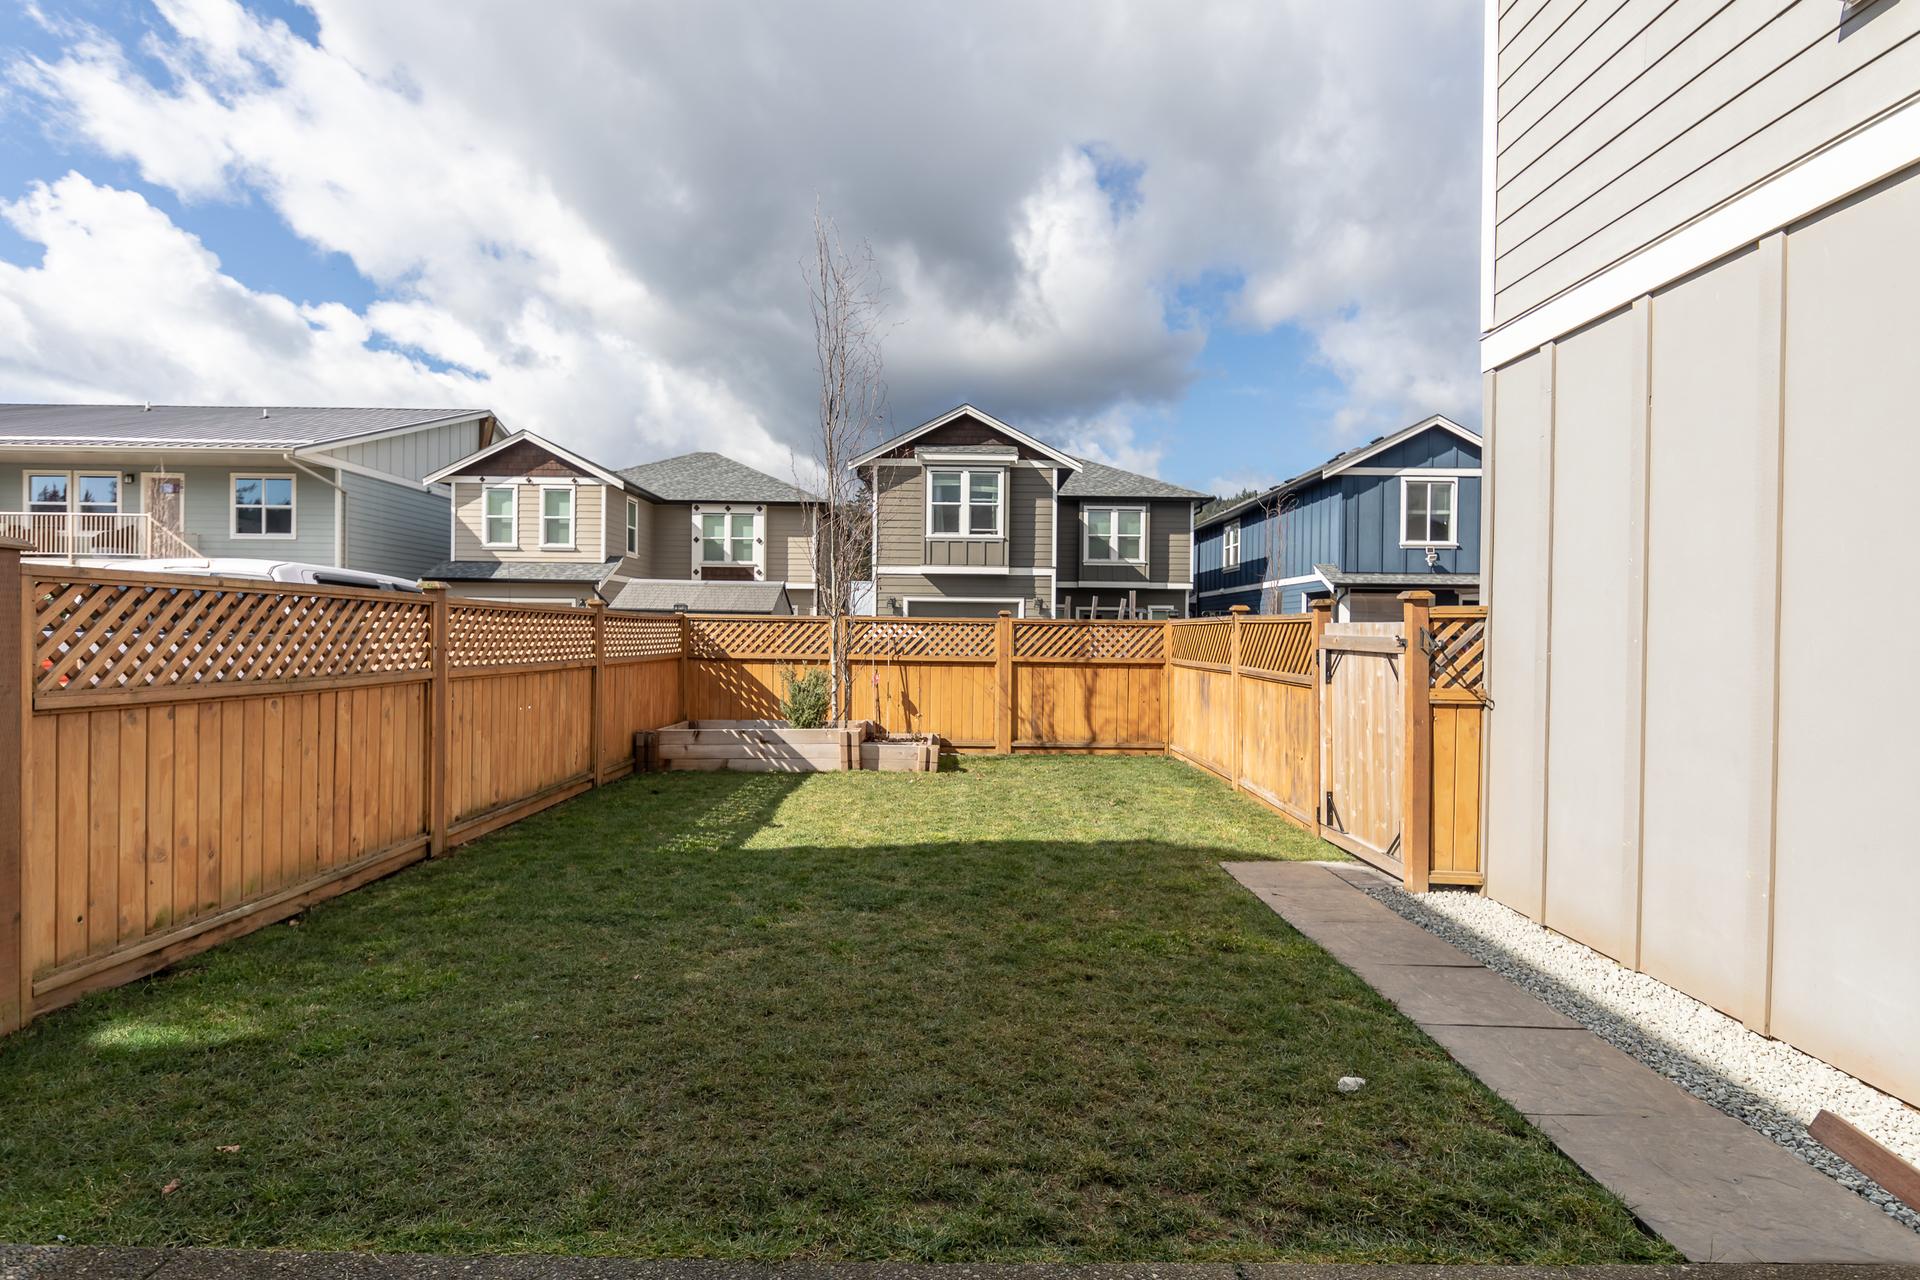 Fenced Yard With Underground Sprinklers at 3288 Merlin Road, Langford Langford, Vancouver Island